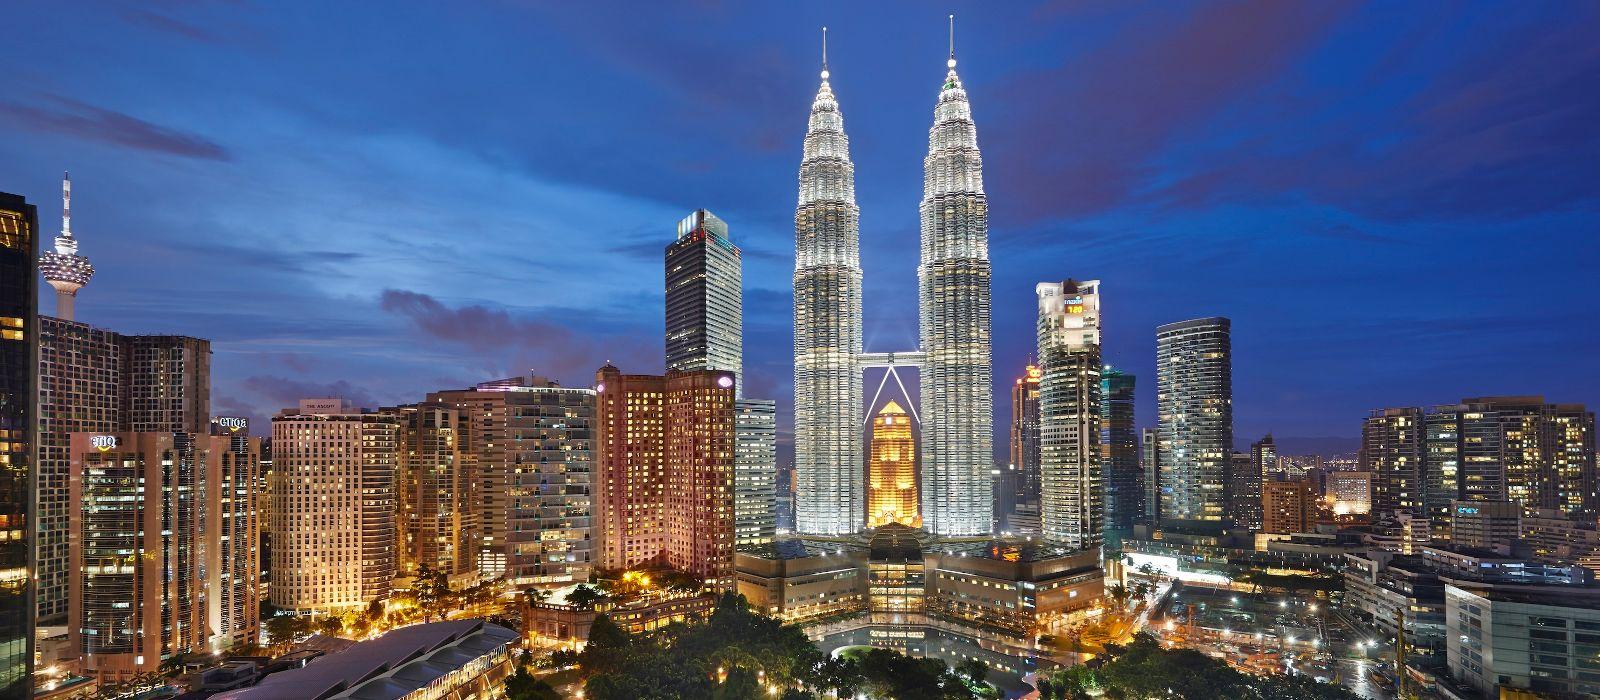 Reiseziel Kuala Lumpur Malaysia